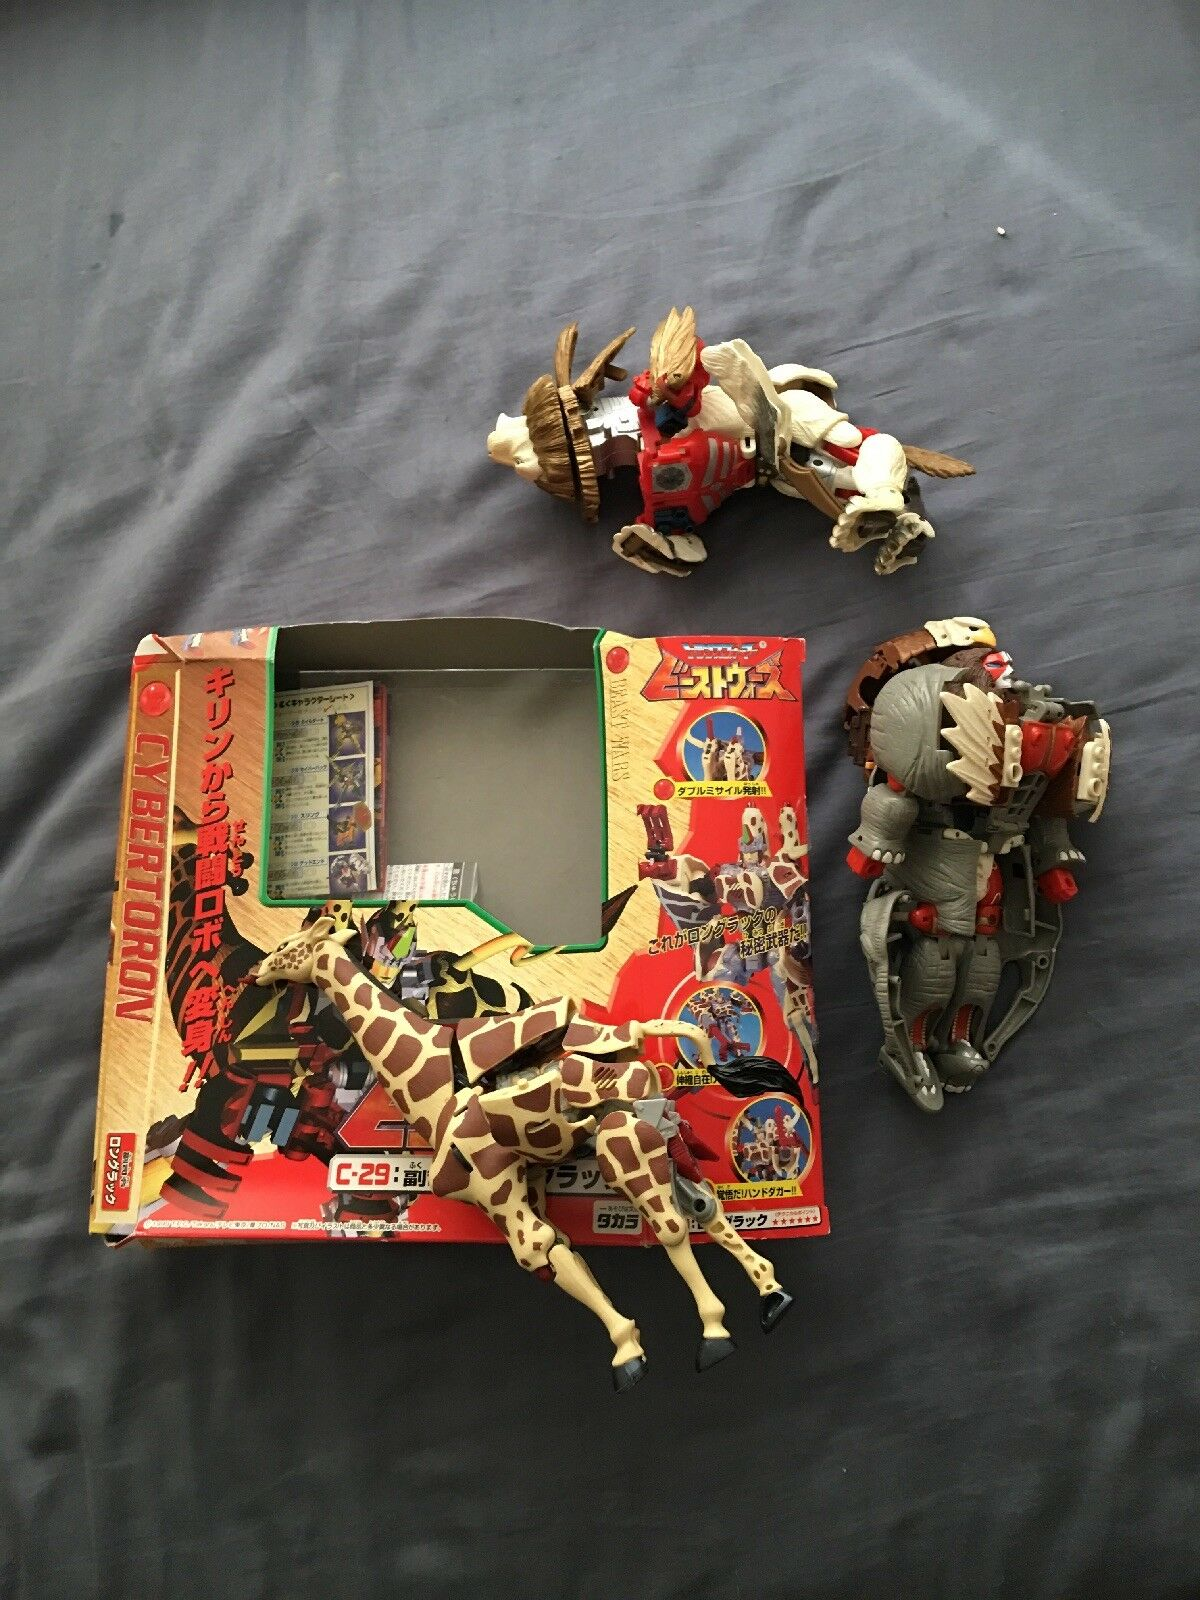 Transformers beast wars II 2 magnaboss Japan Neo Longrack Lio Convoy Lot